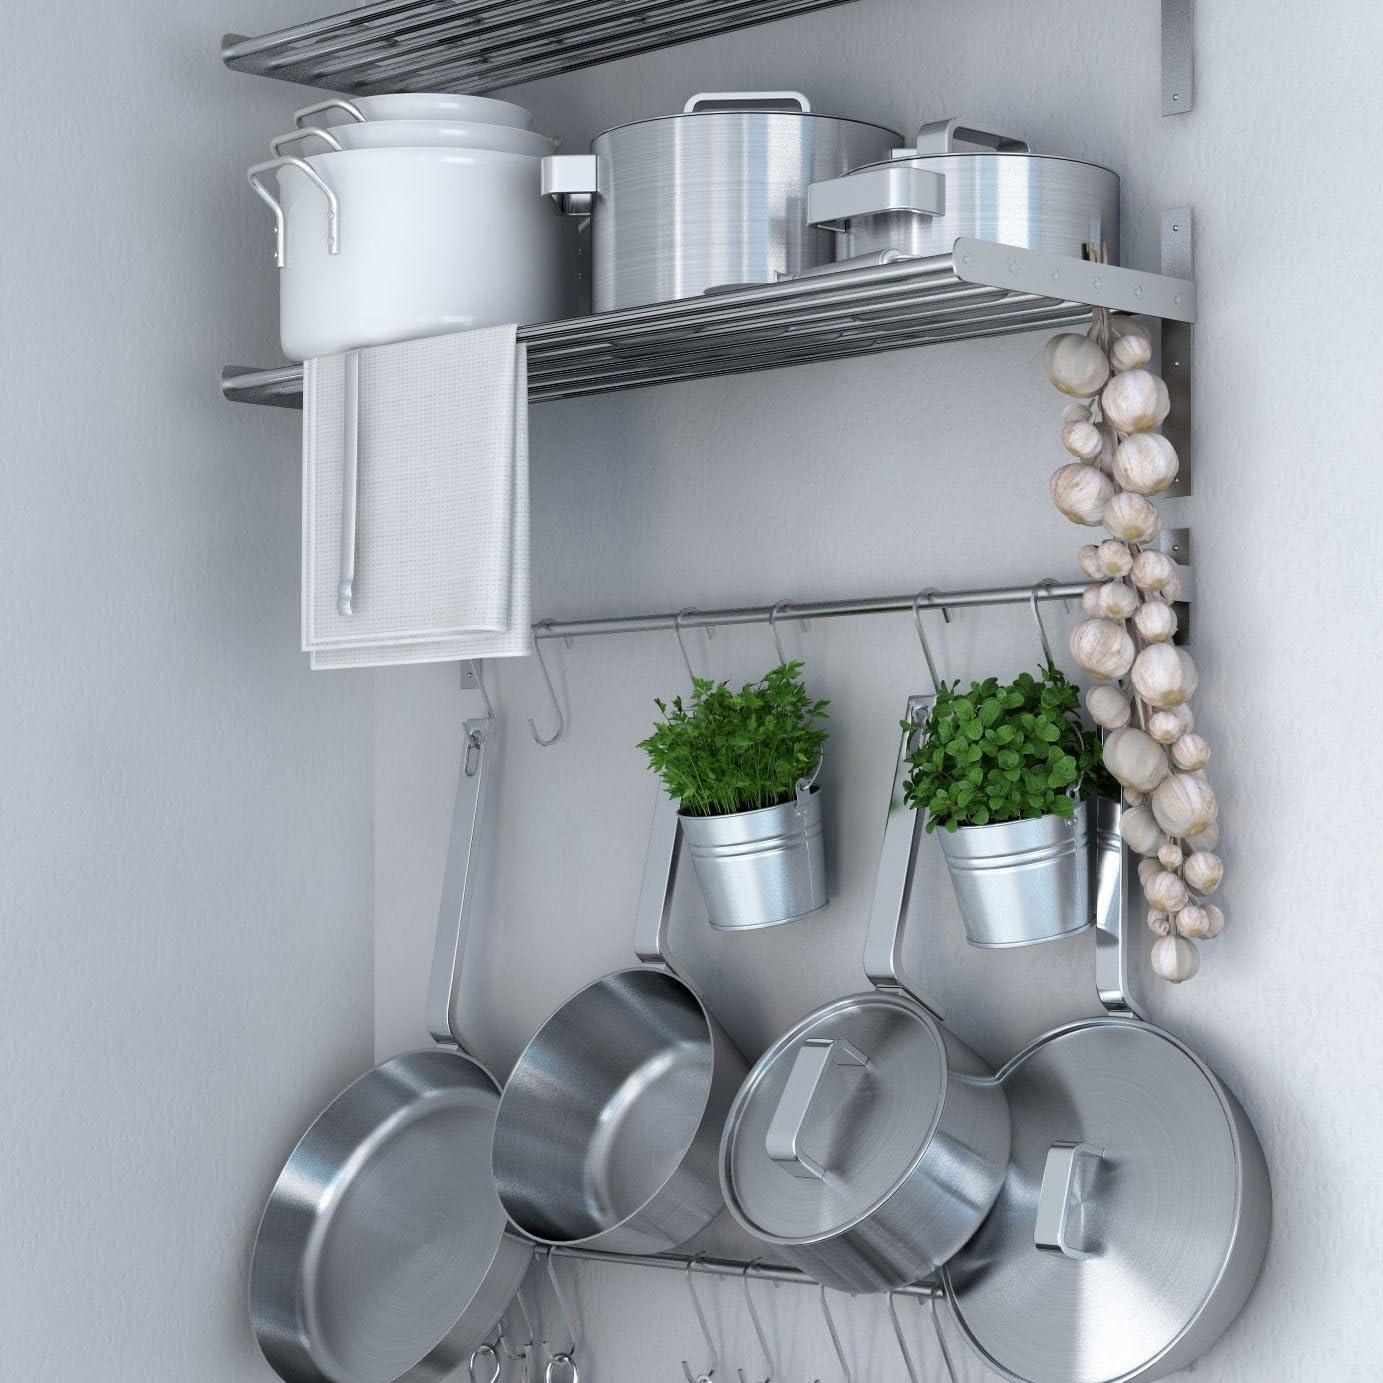 Amazon Com Ikea Grundtal Stainless Steel Wall Shelf Rail And 15 Large Hooks Set Kitchen Storage And Organizer Set Kitchen Dining